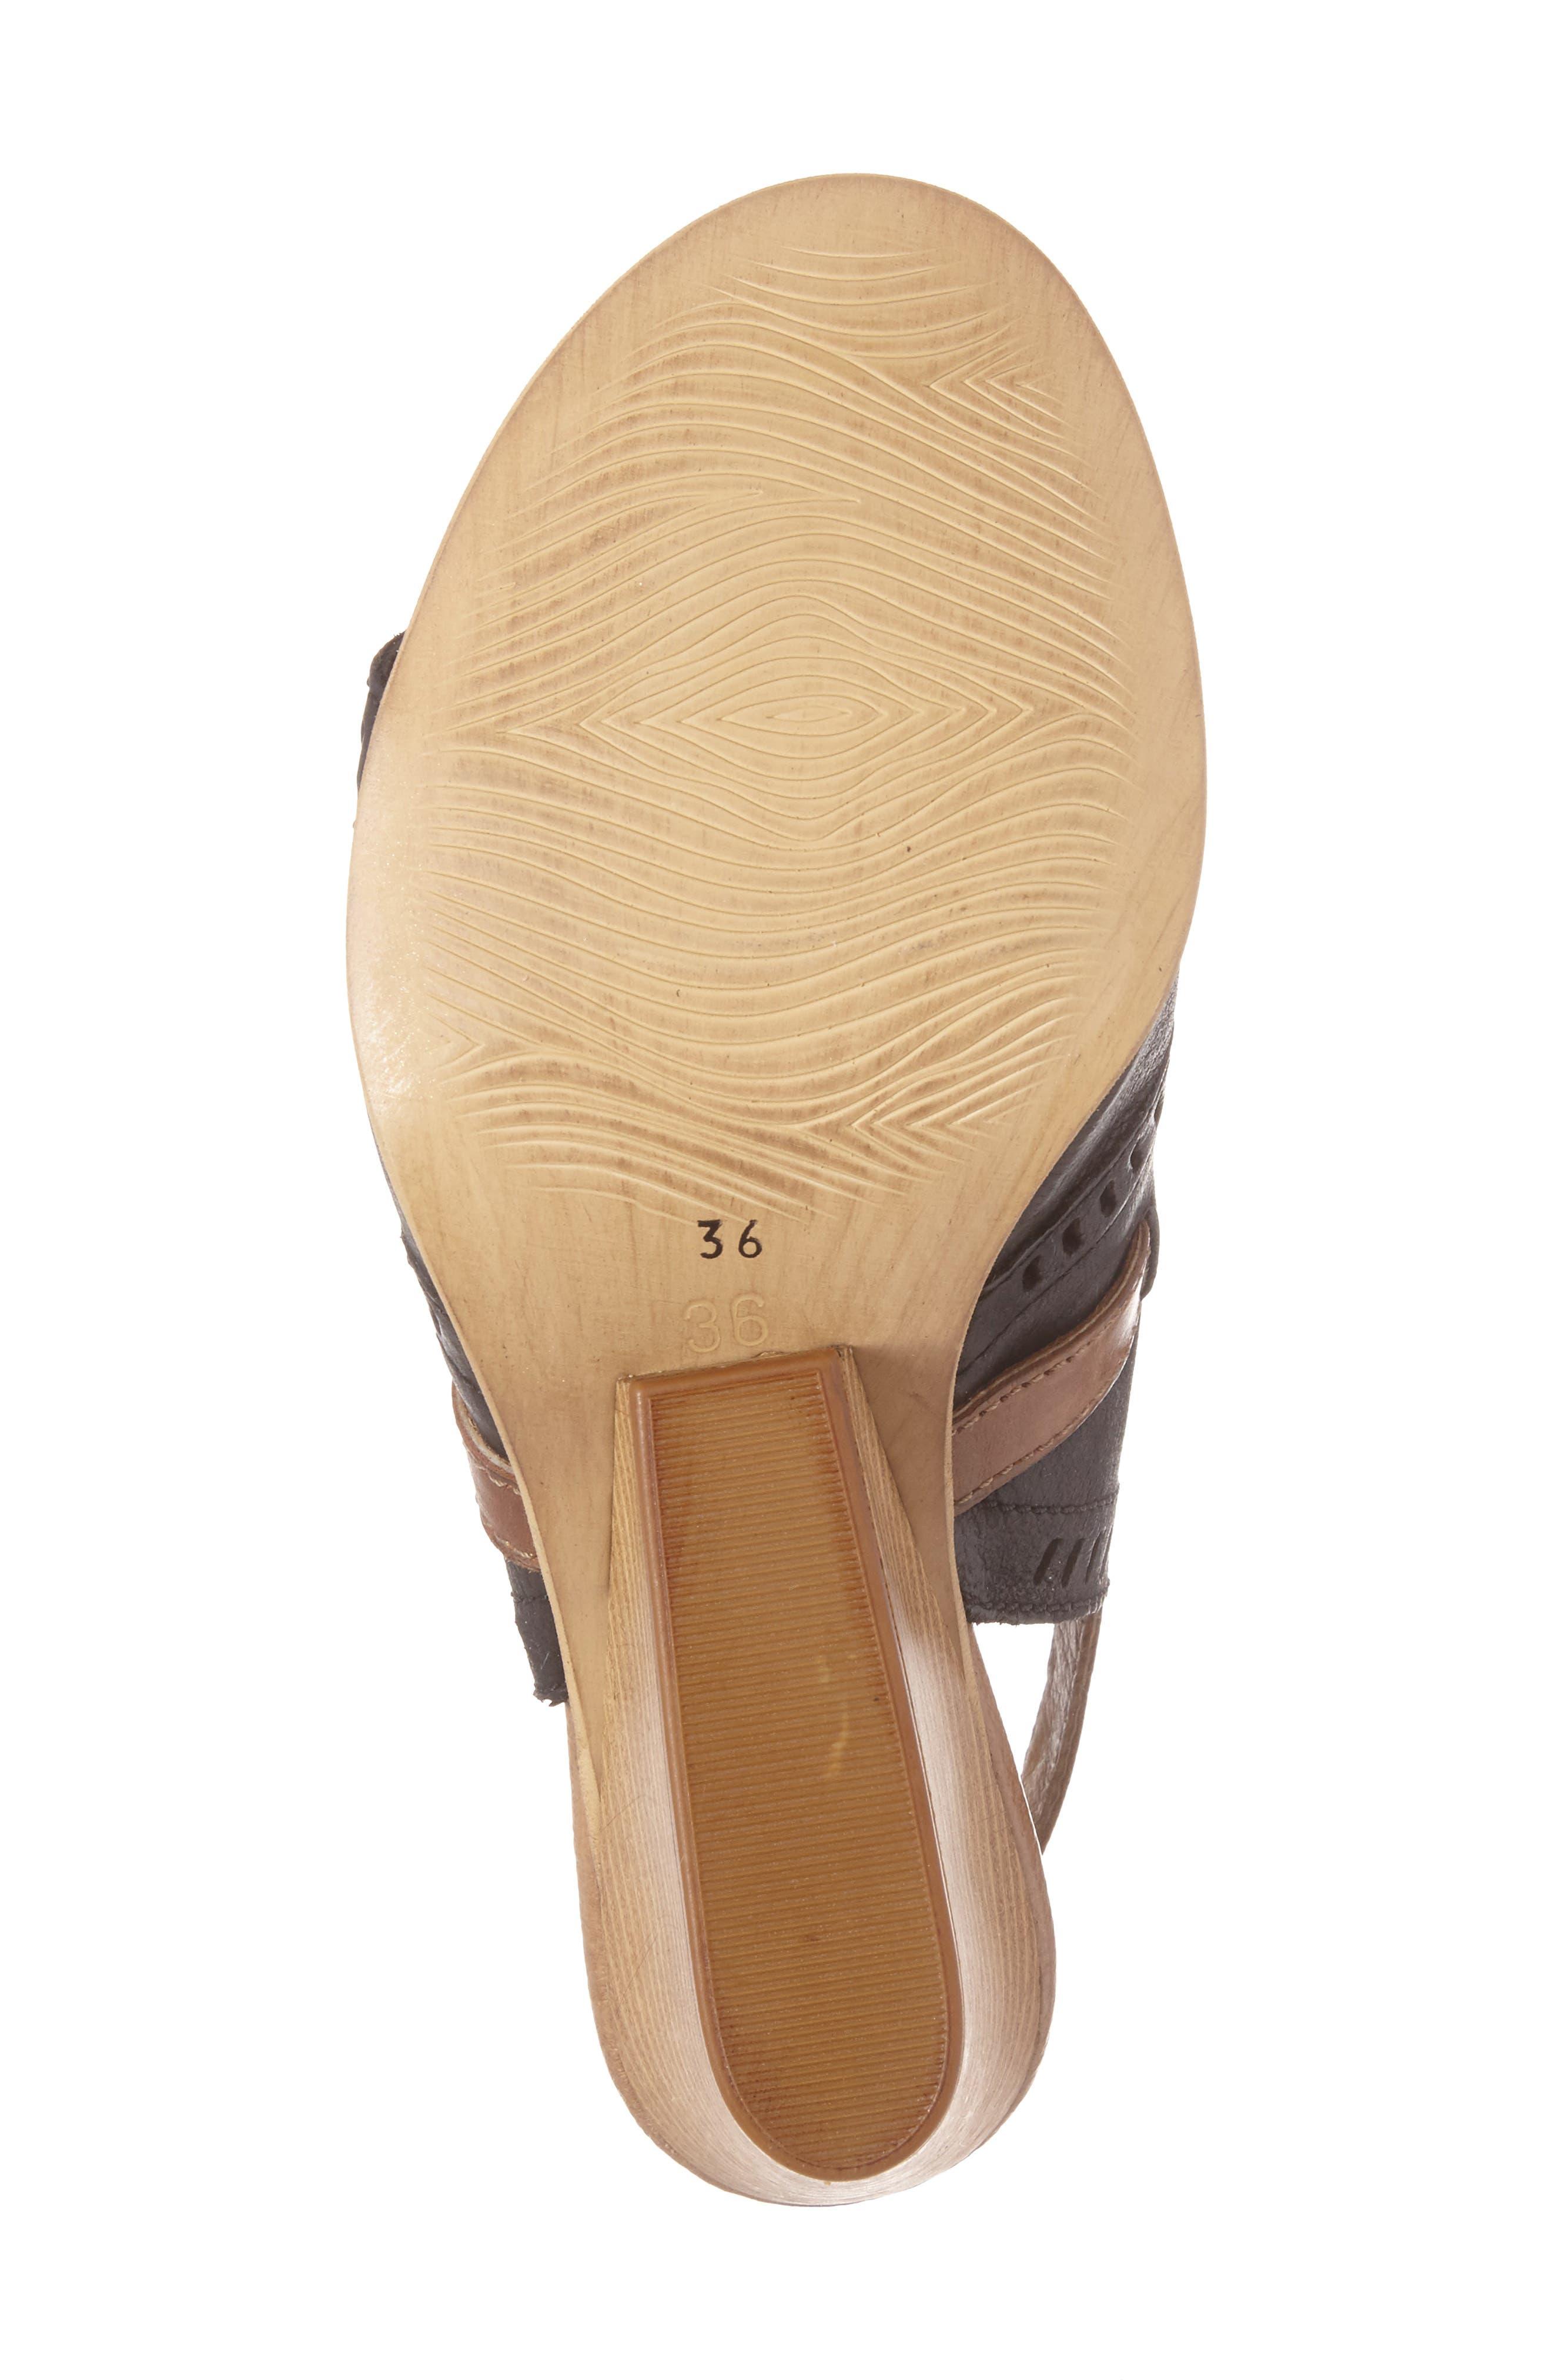 Kipling Perforated Sandal,                             Alternate thumbnail 20, color,